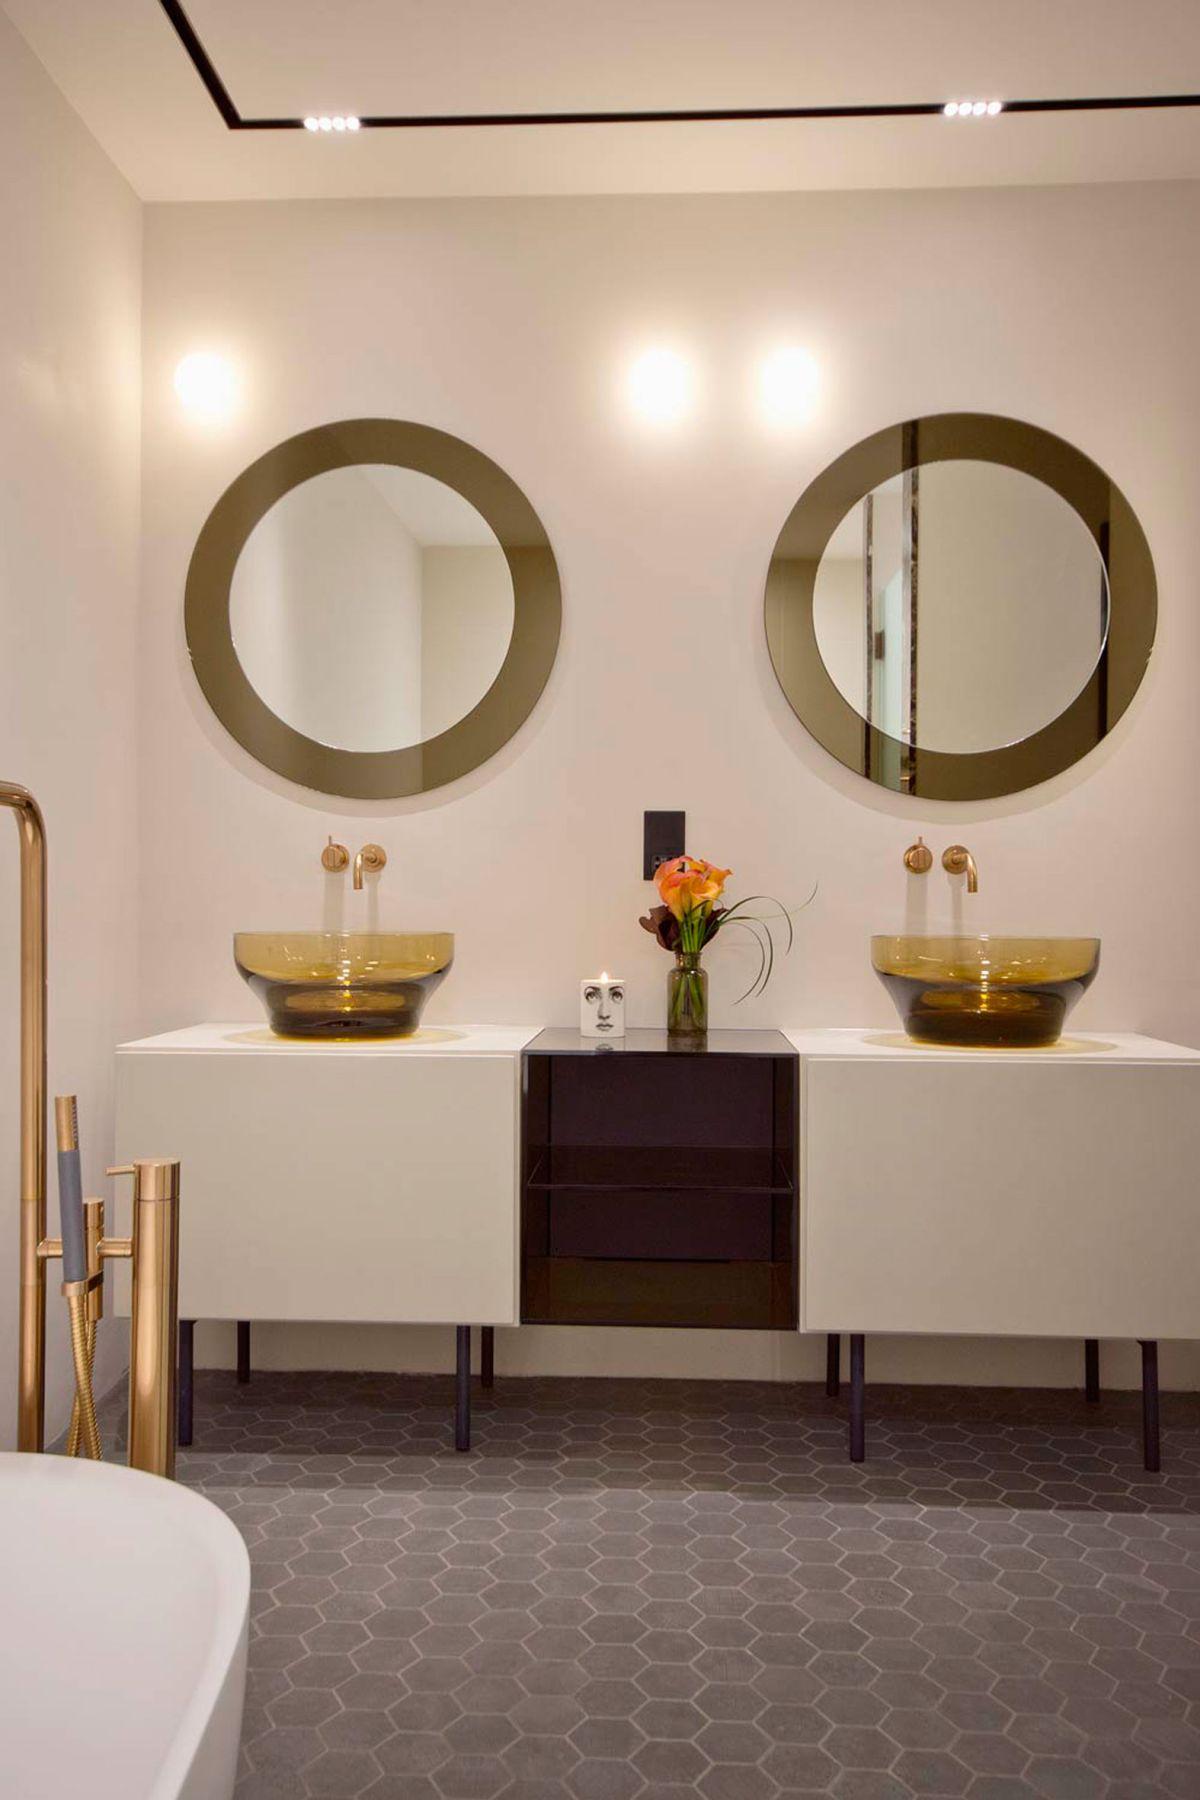 West Apartment Ransome's Dock bathroom vanity